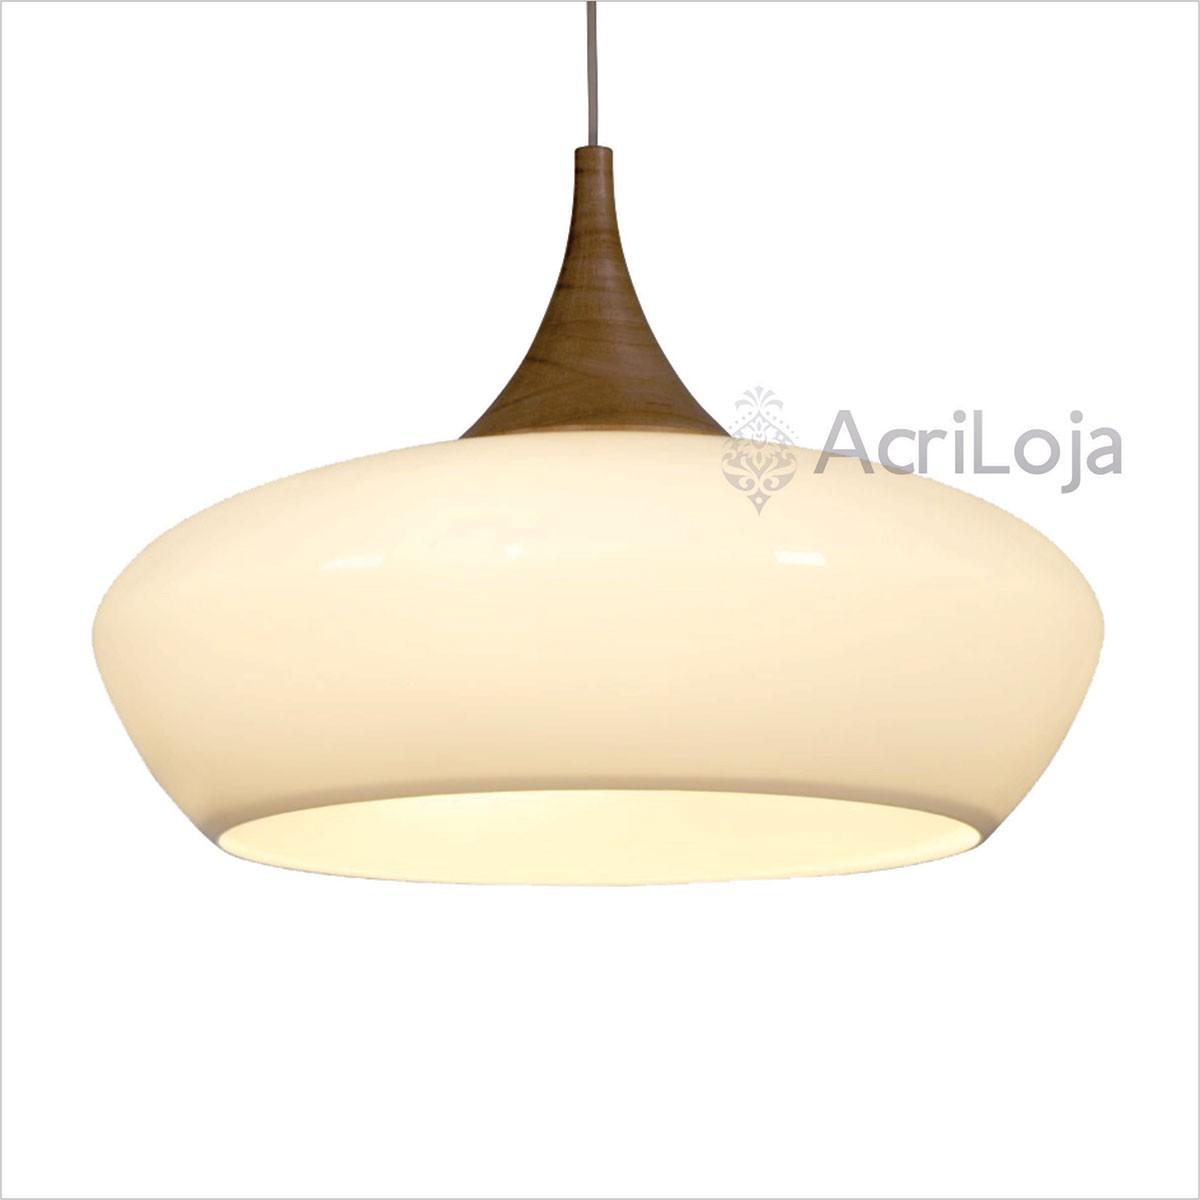 Luminaria Pendente Tune Em Acrílico Branco 60x41 3 Lâmpadas, Lustre de teto